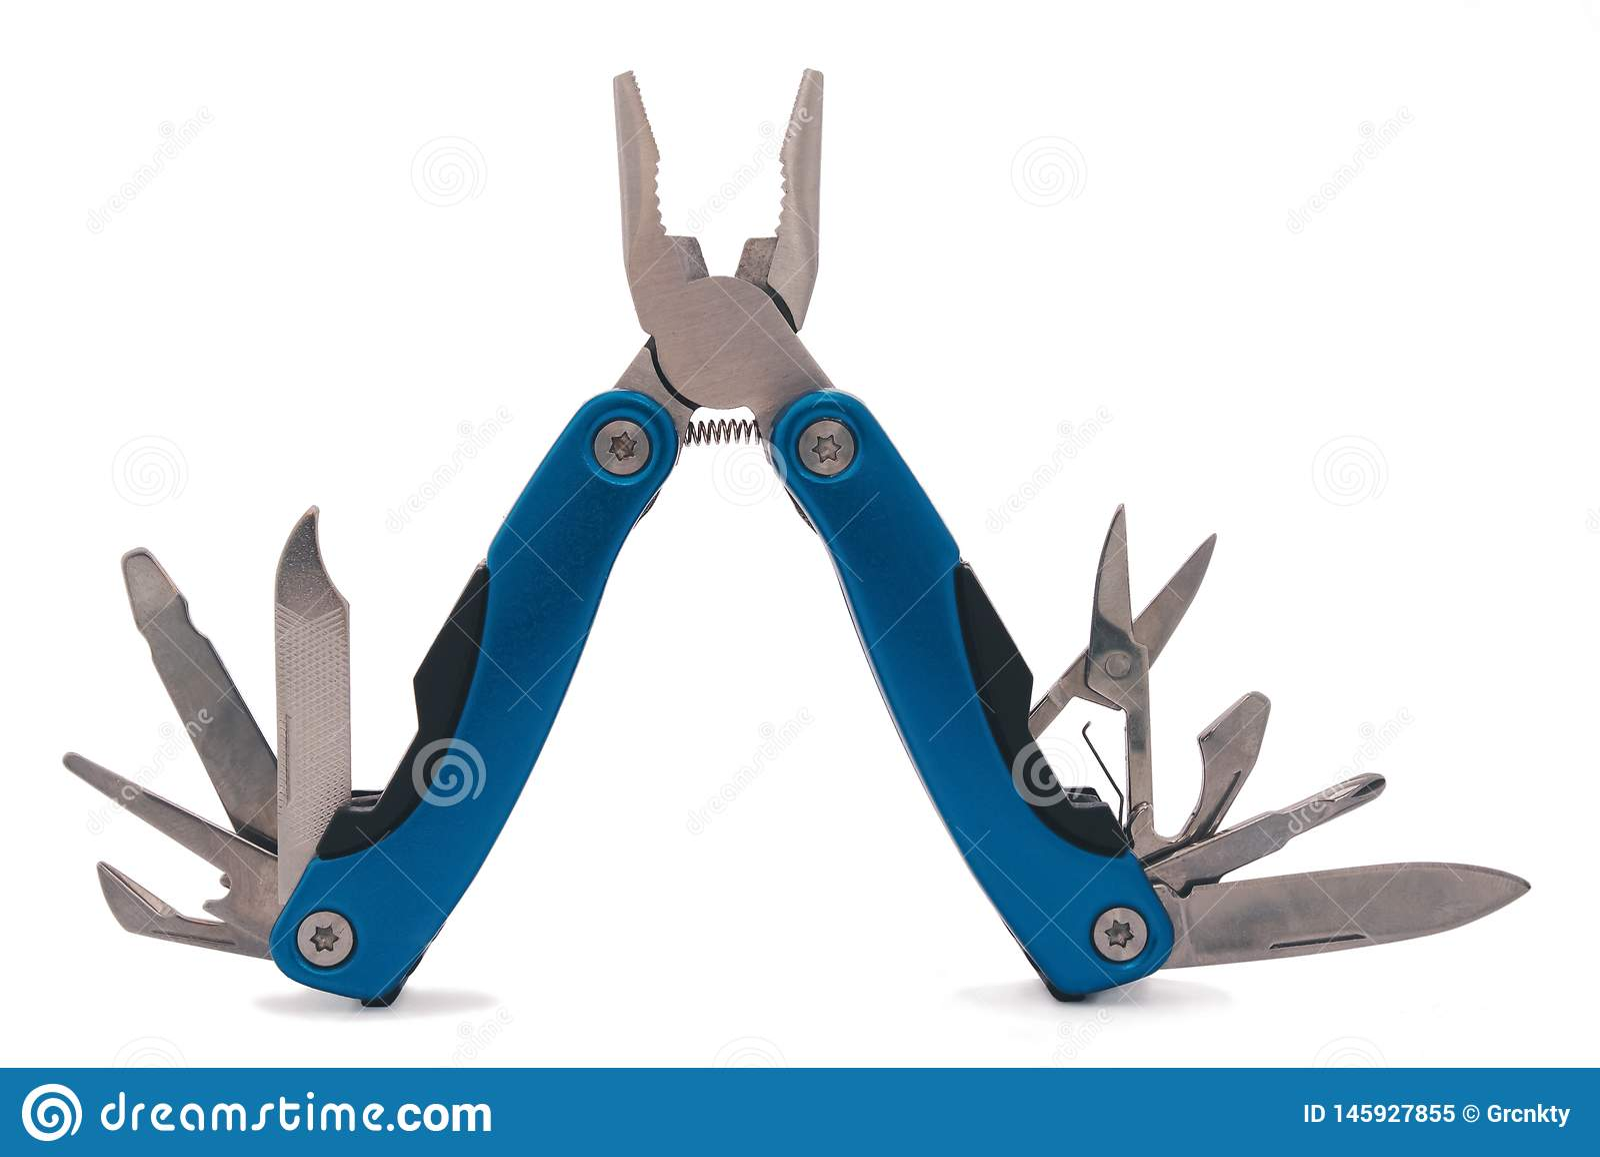 Cuchillo plegable